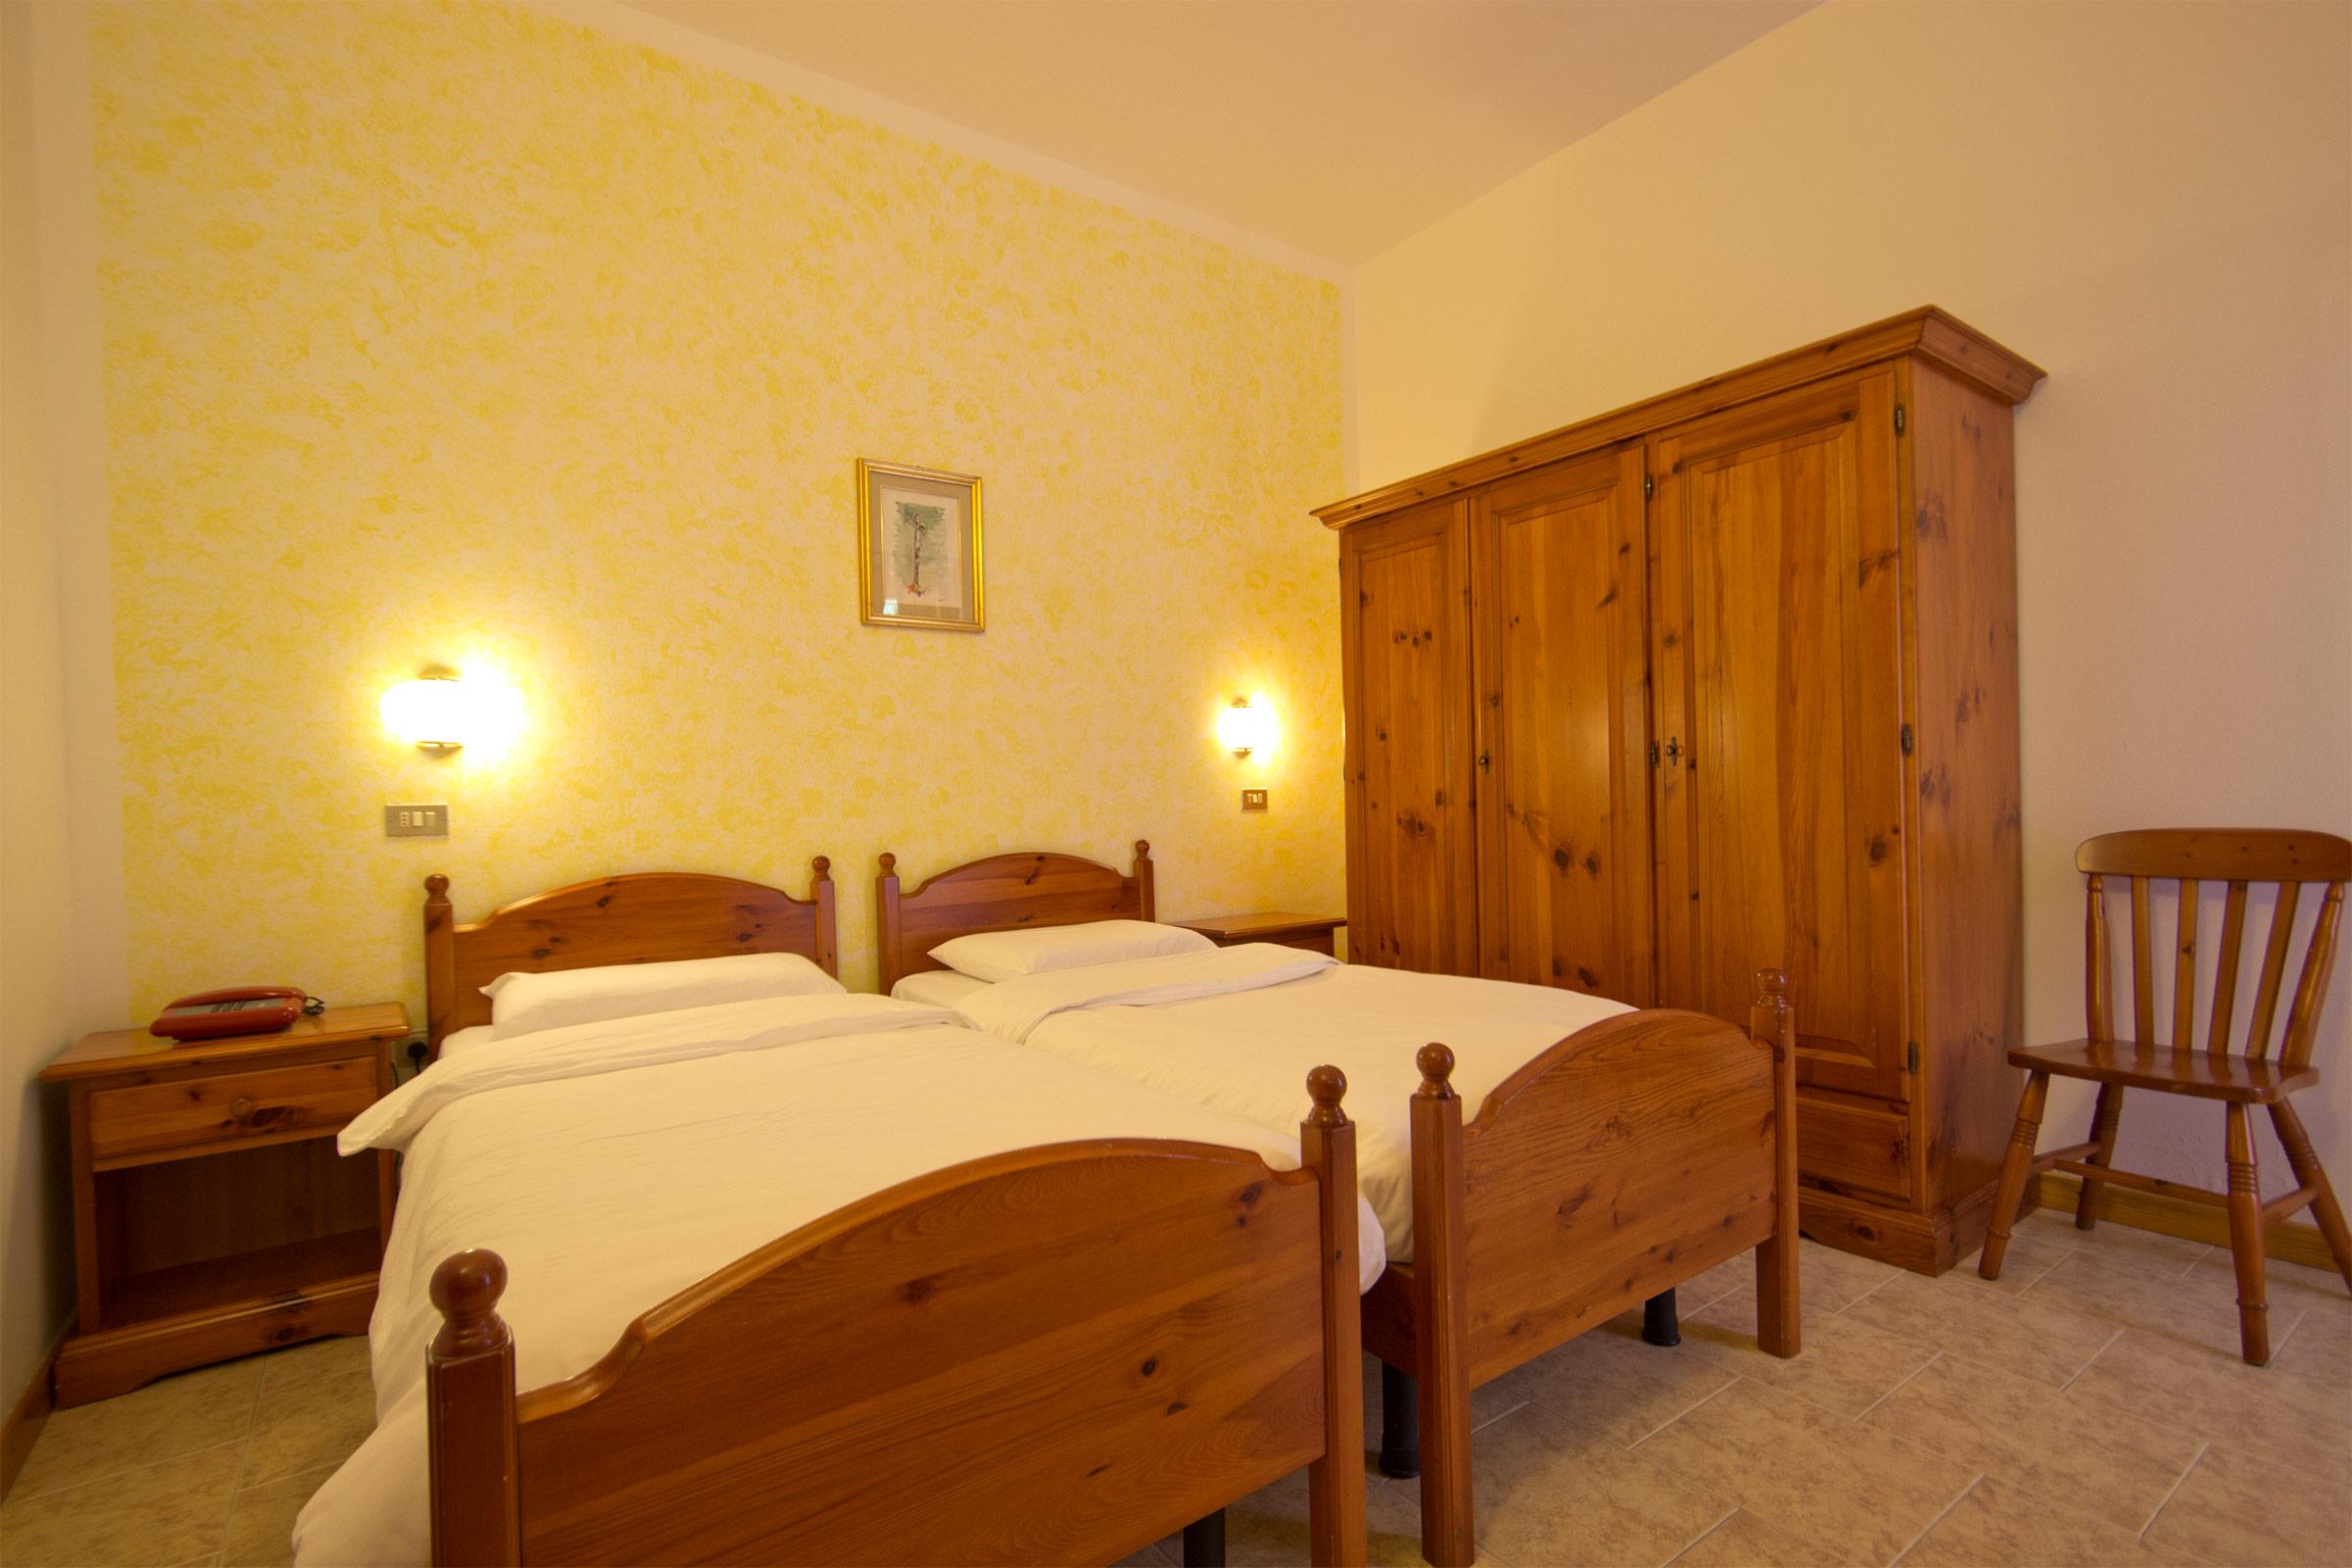 hotel-santa-maria-rooms-7